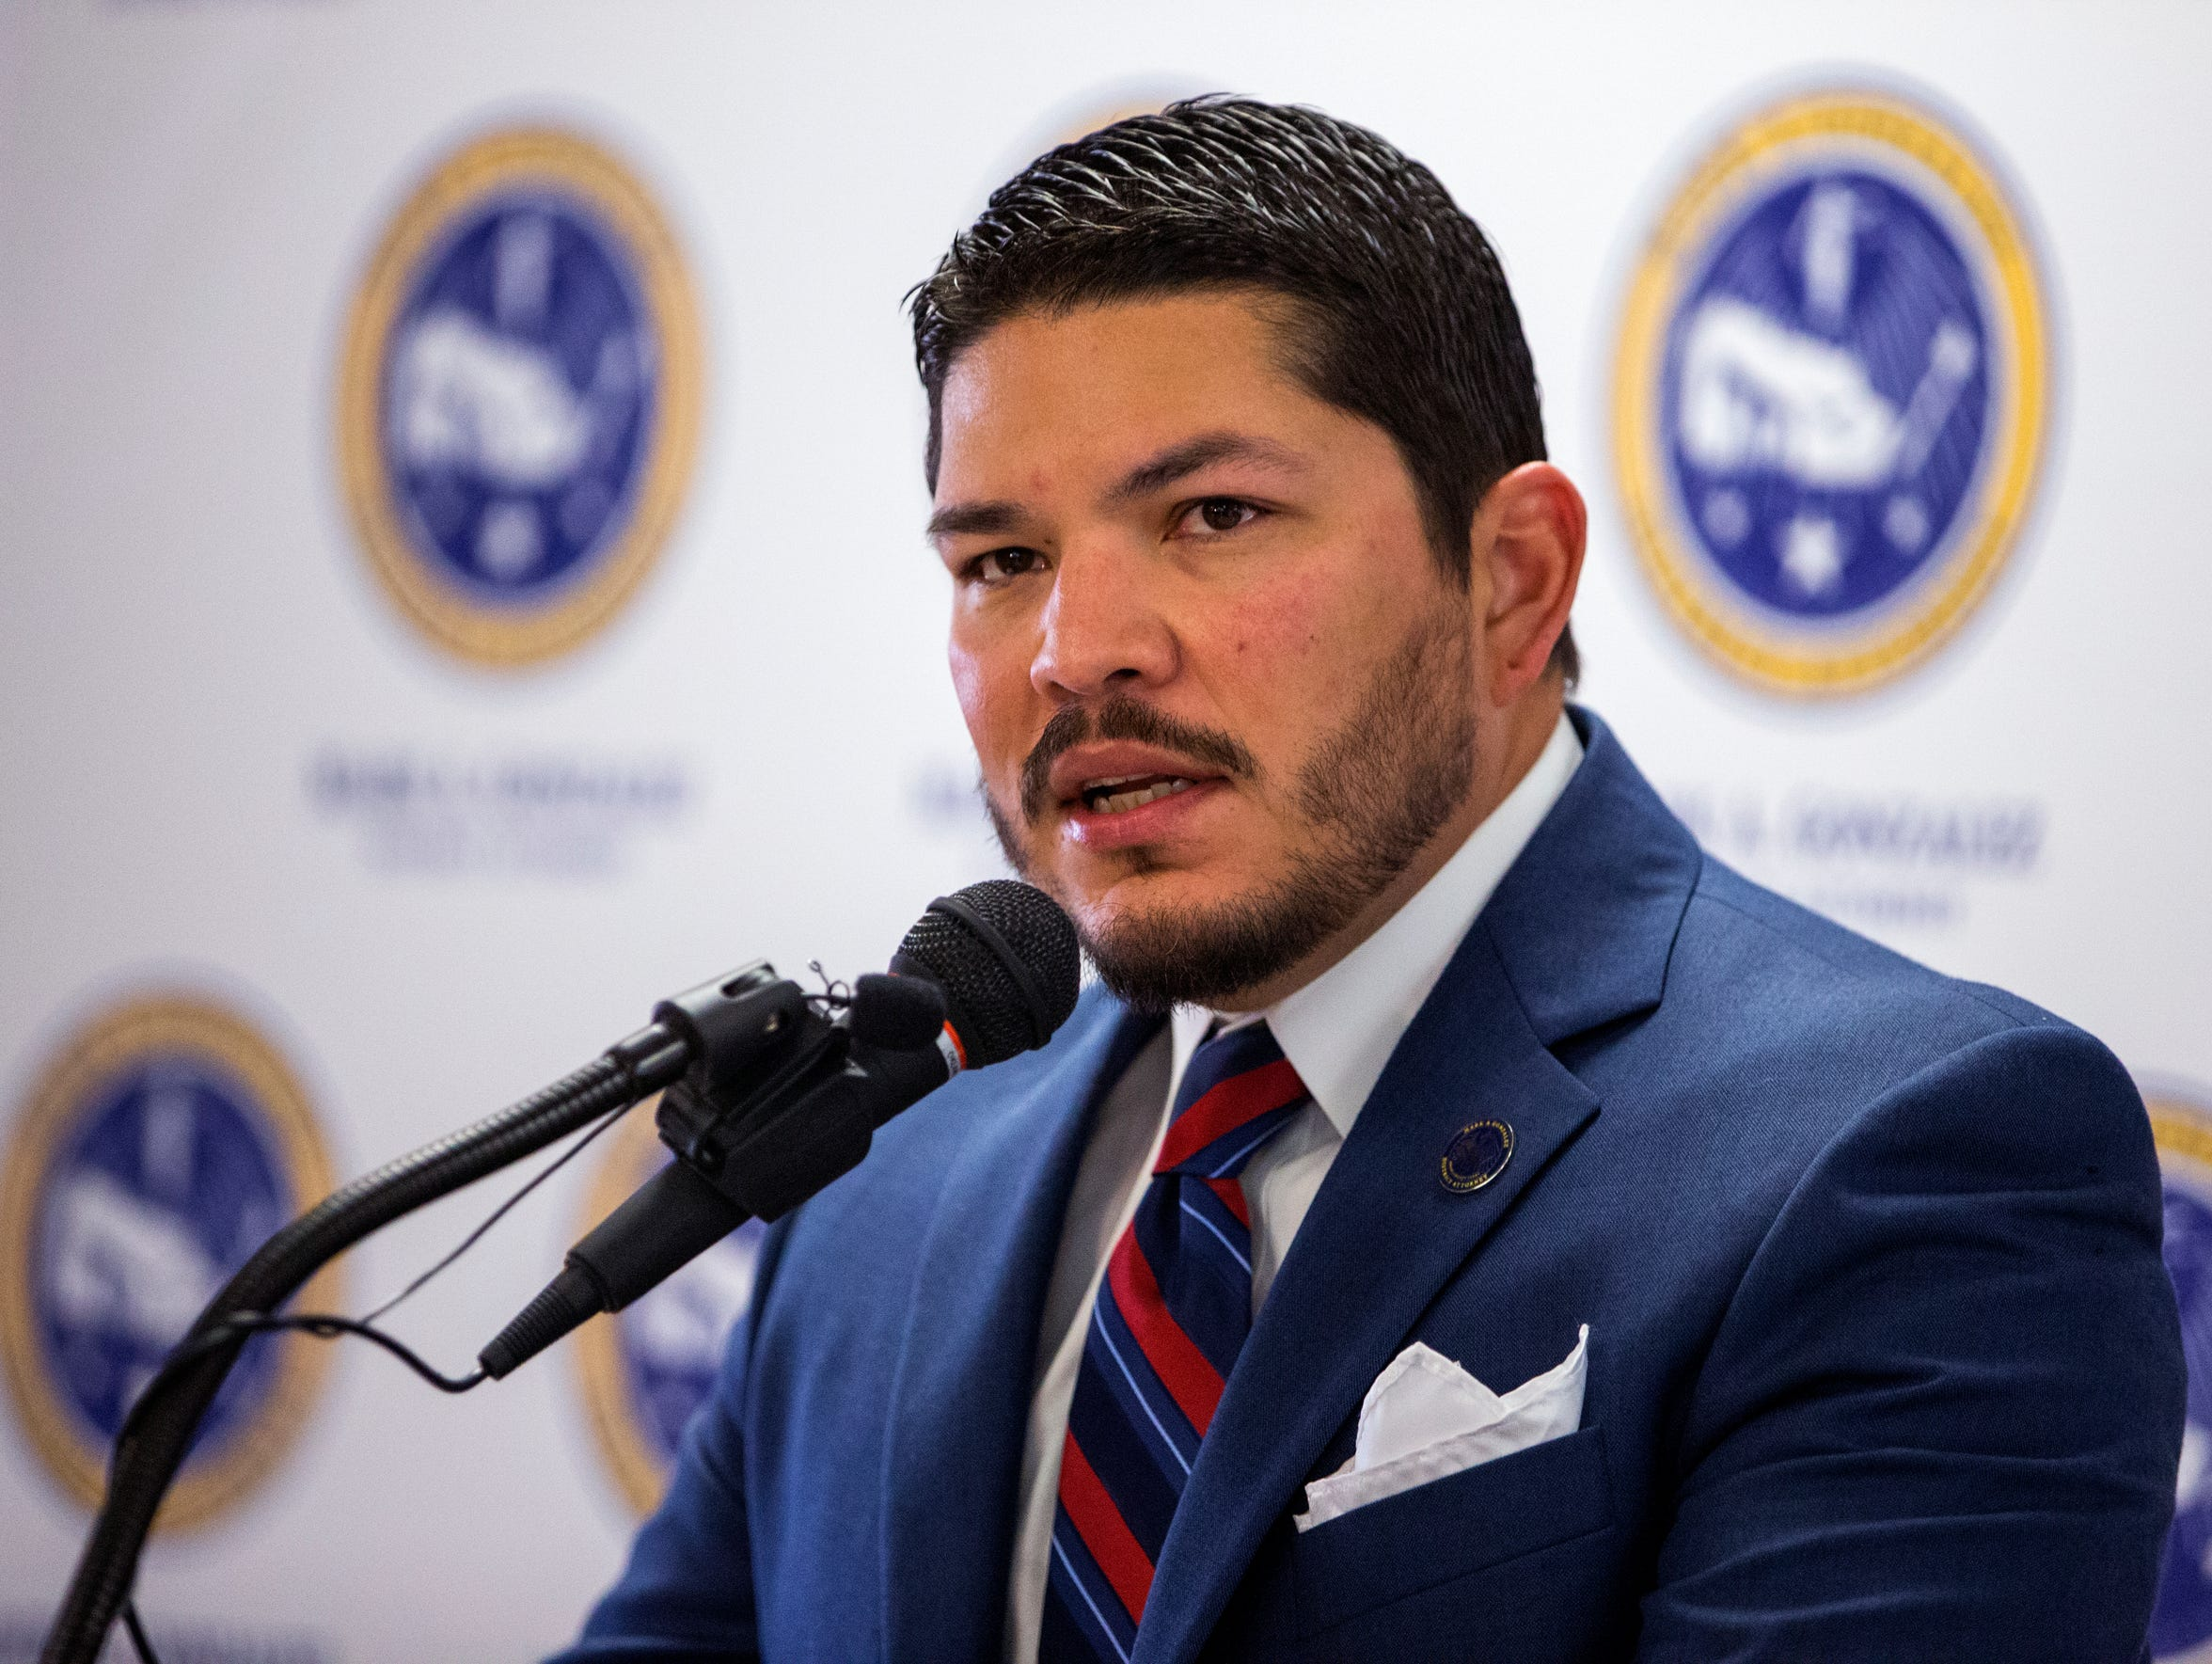 Nueces County District Attorney Mark Gonzalez said